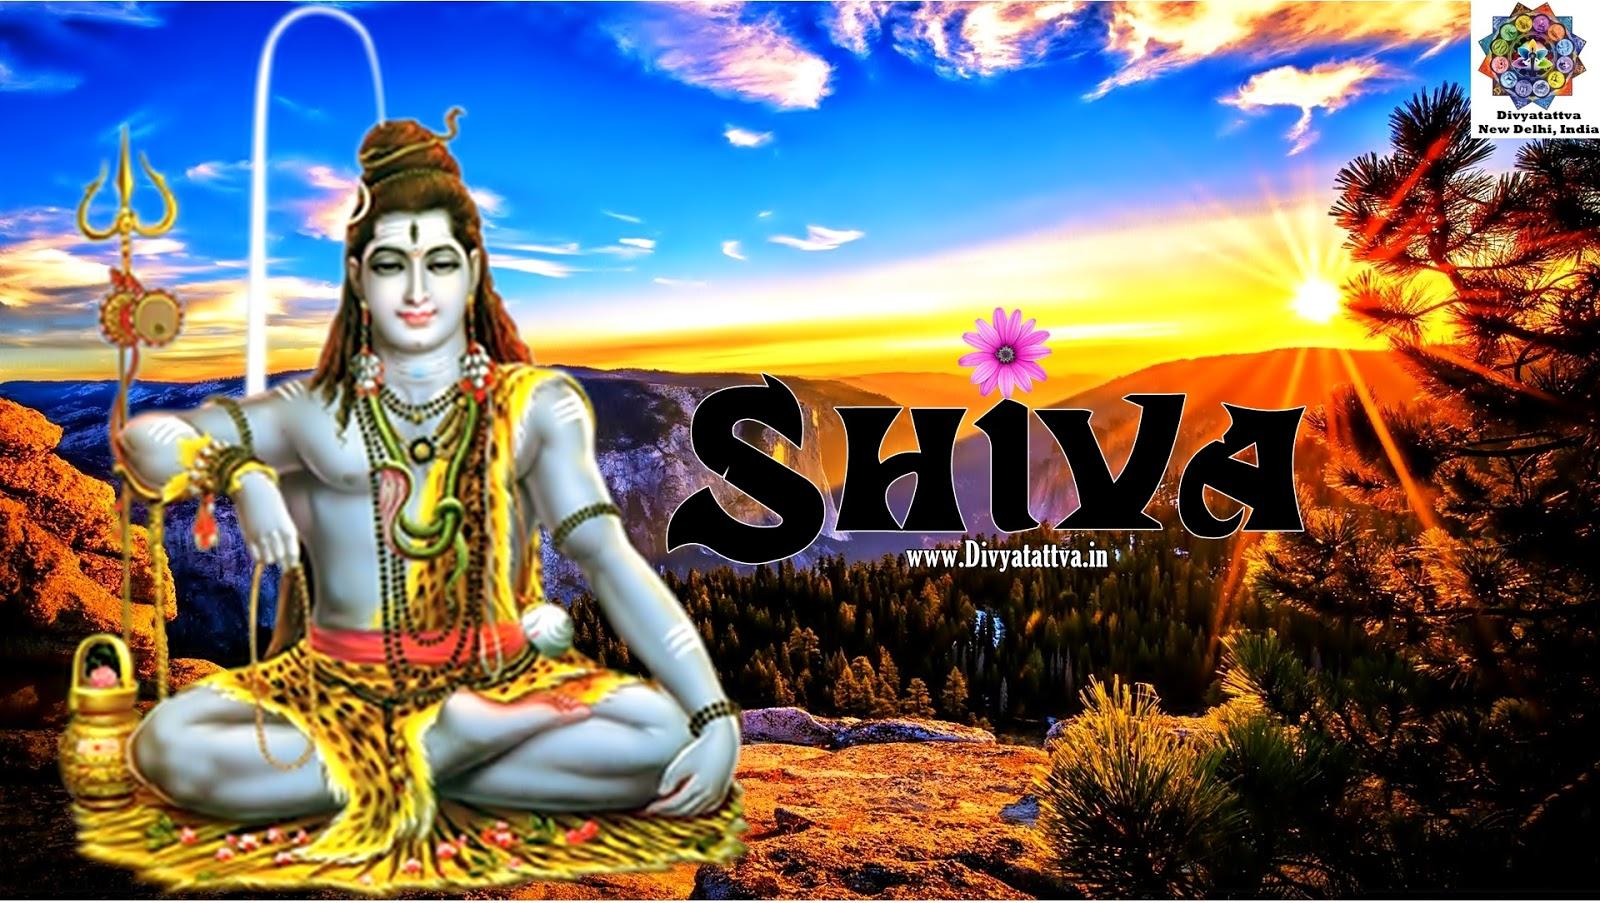 Free Lord Shiva Wallpapers Hindus God Shiv Ji Photos 3d Backgrounds